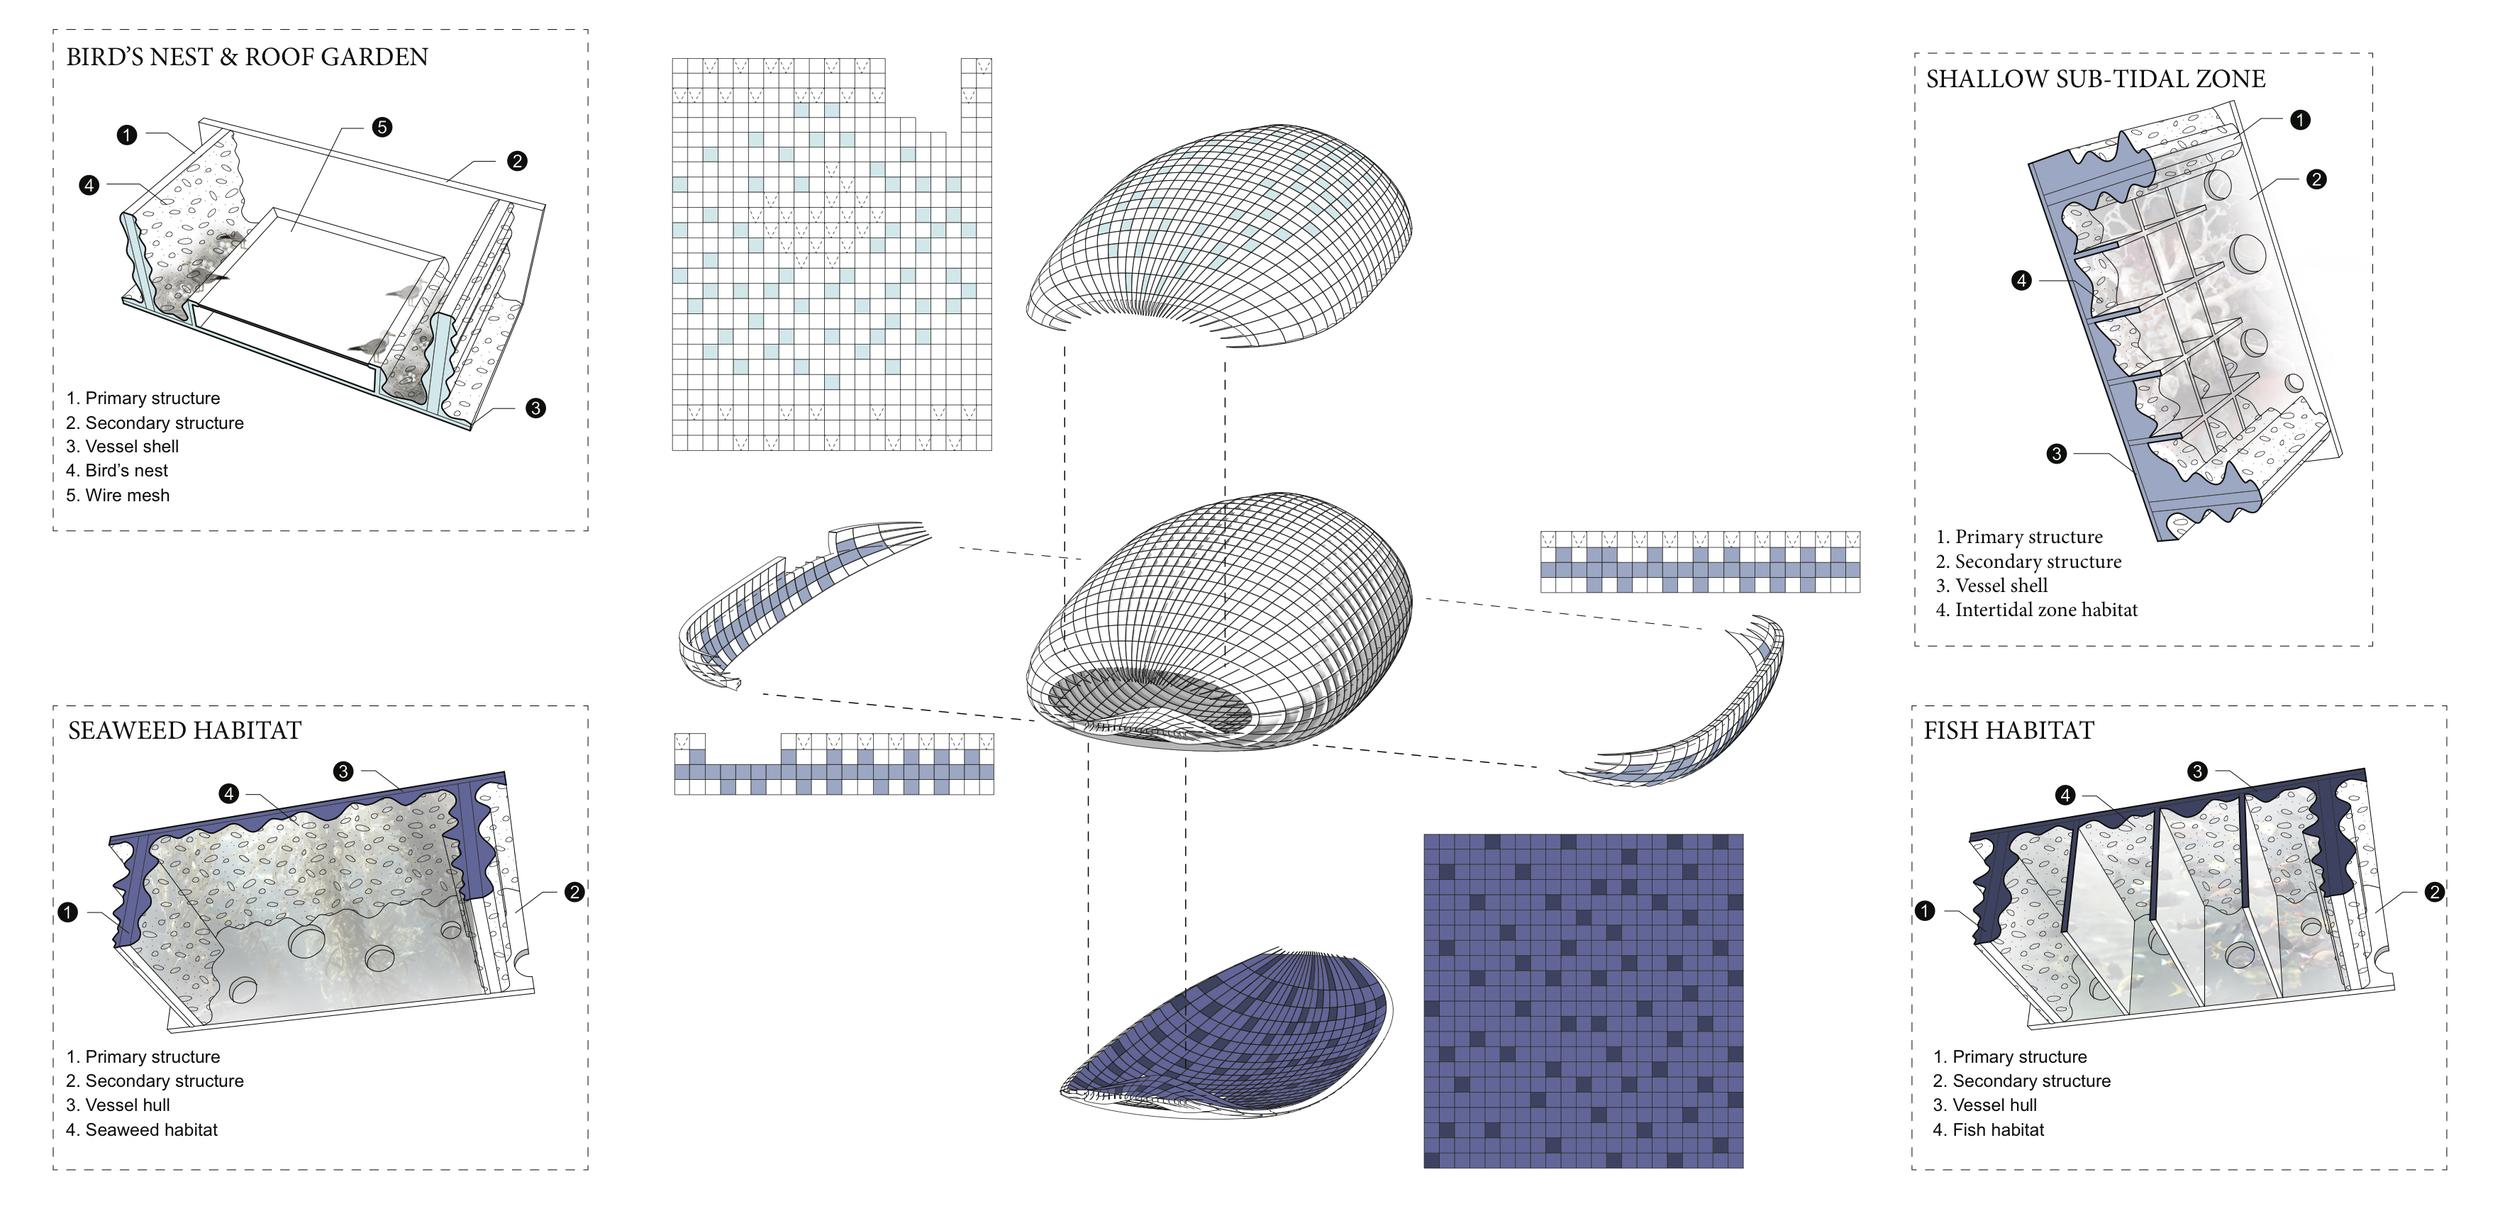 Adaptive Creature, by Jill Chin-Han Chao, Hung-yi Chou, and Sanna Lee